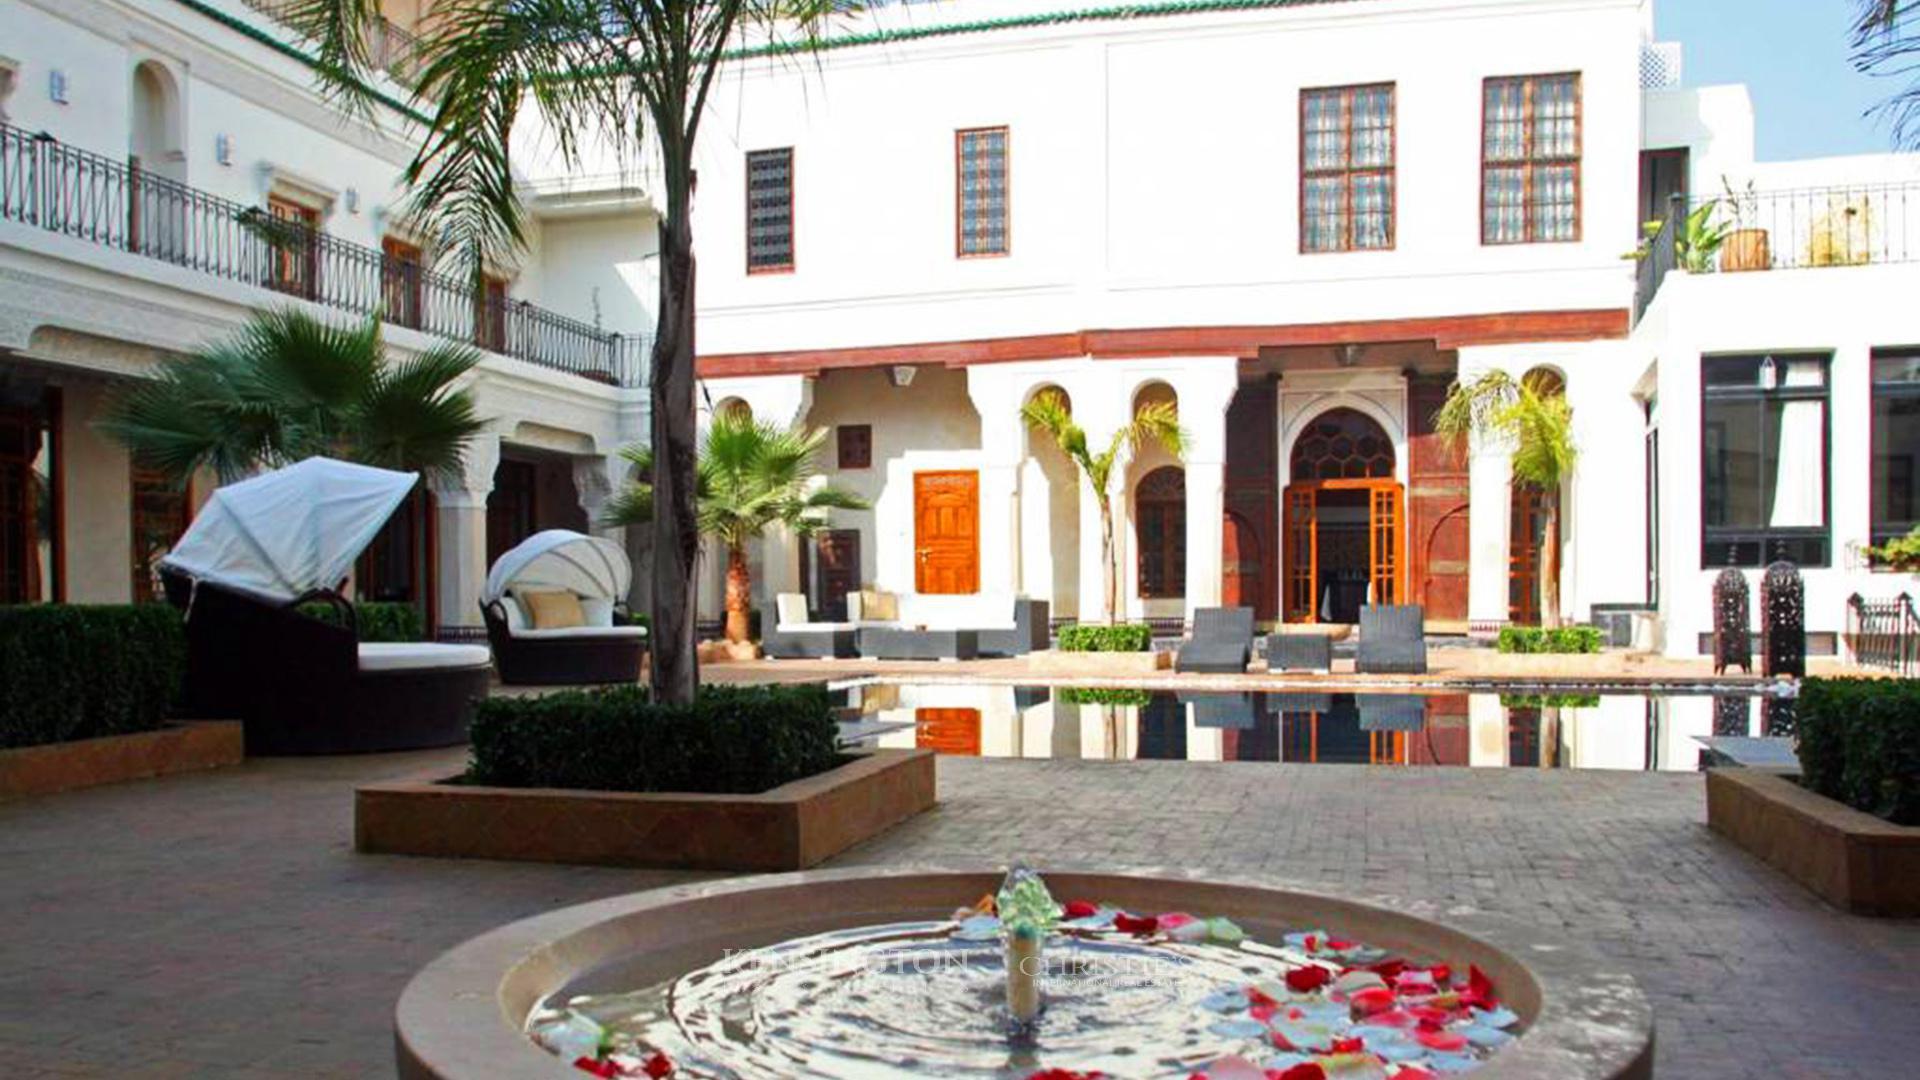 KPPM00507: Historic Palace in Fez Medina Riad Fèz Morocco